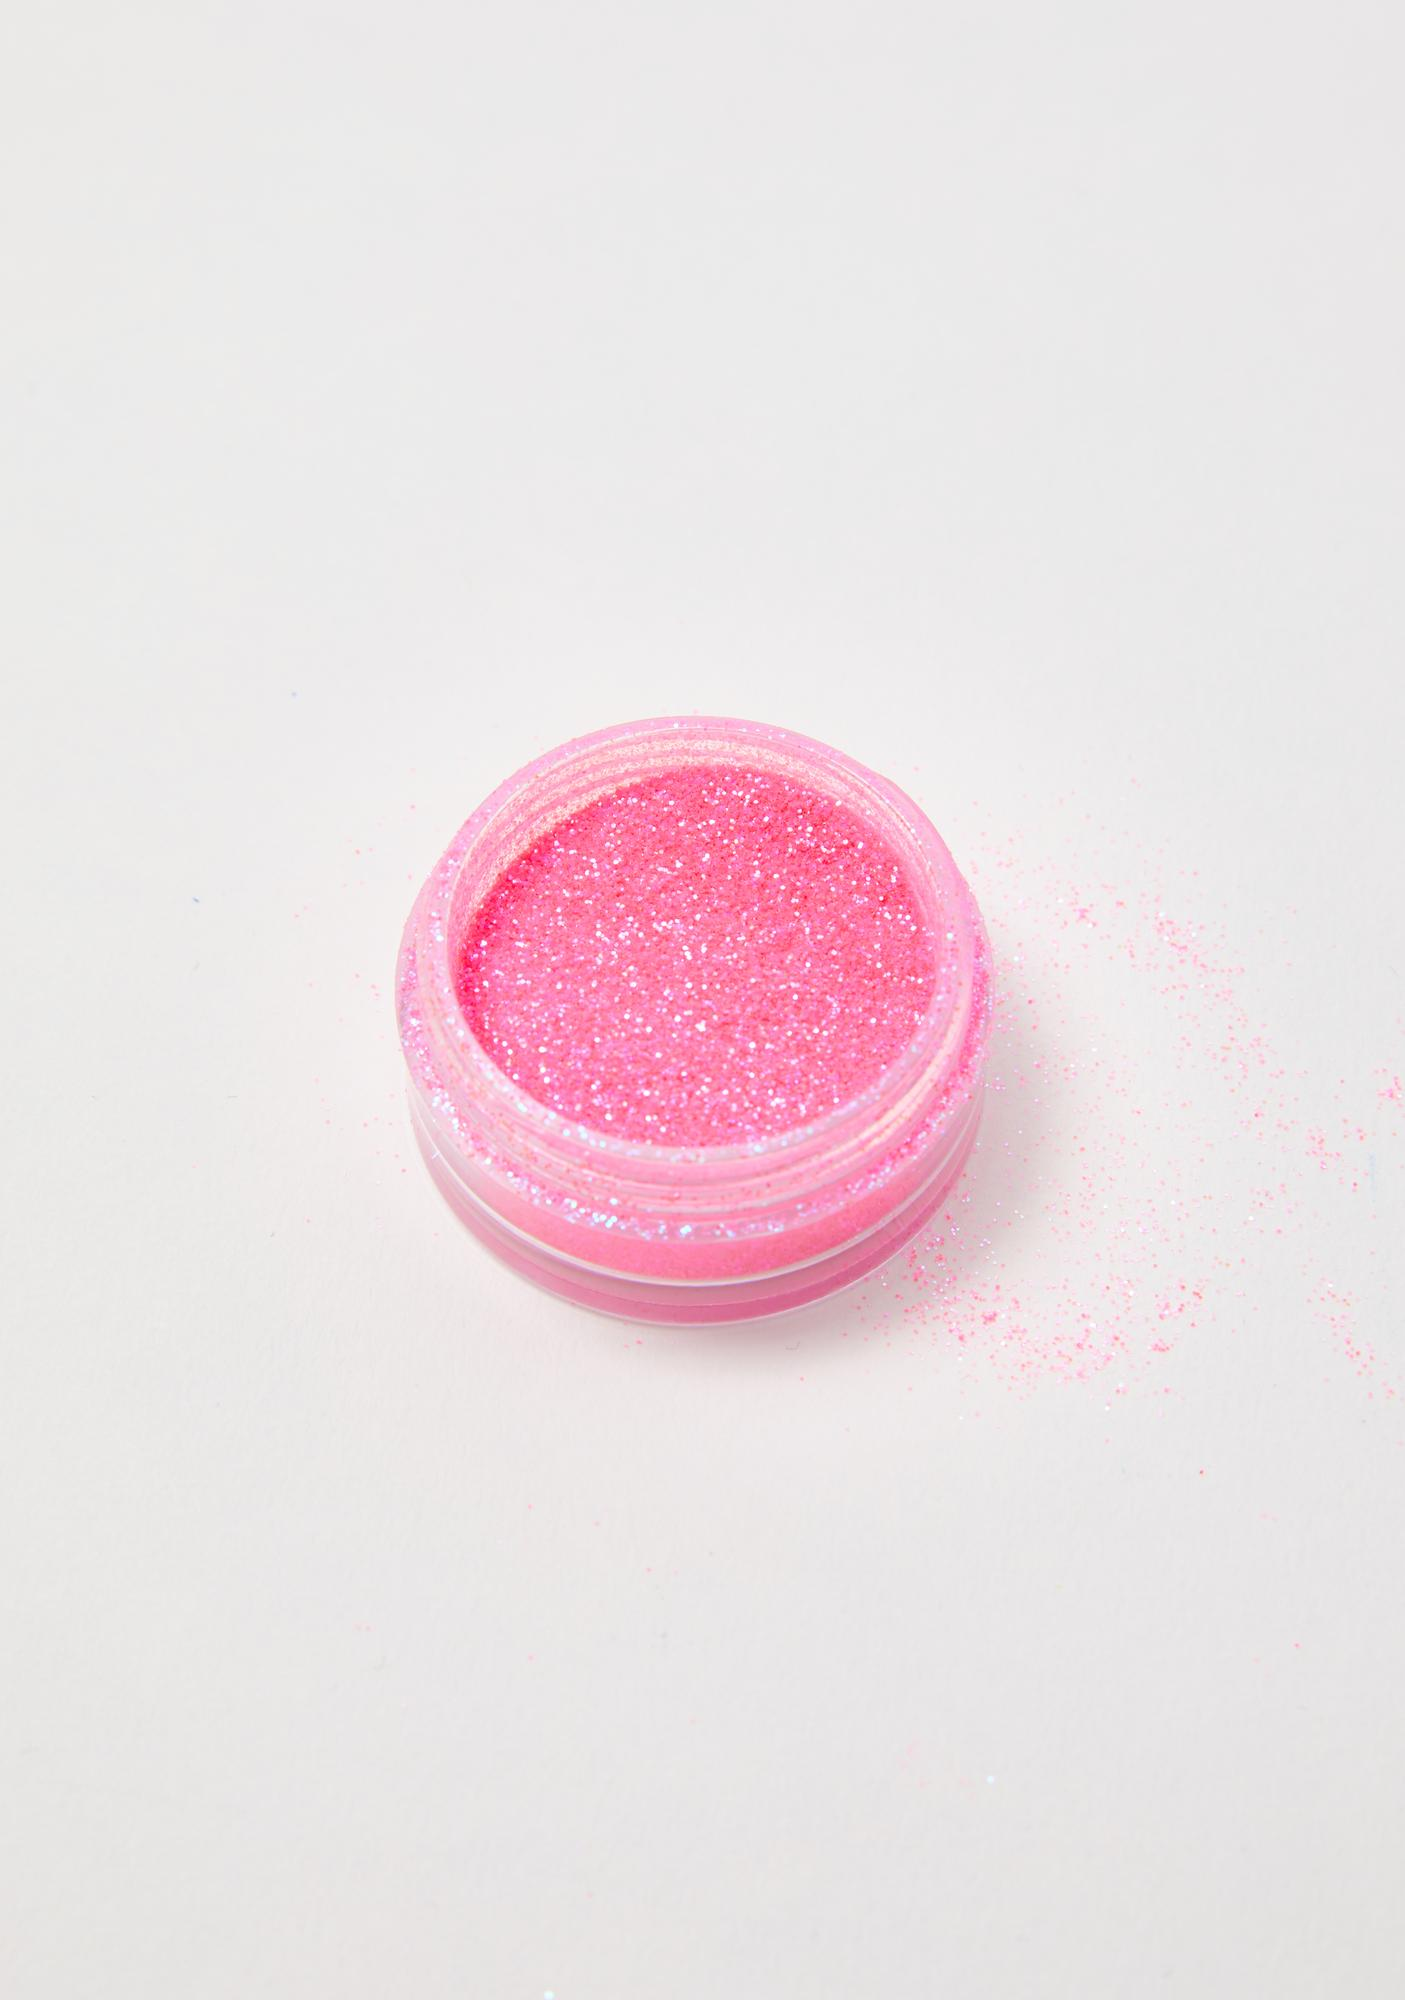 Give Face Cosmetics Jasmine UV Reactive Glitter